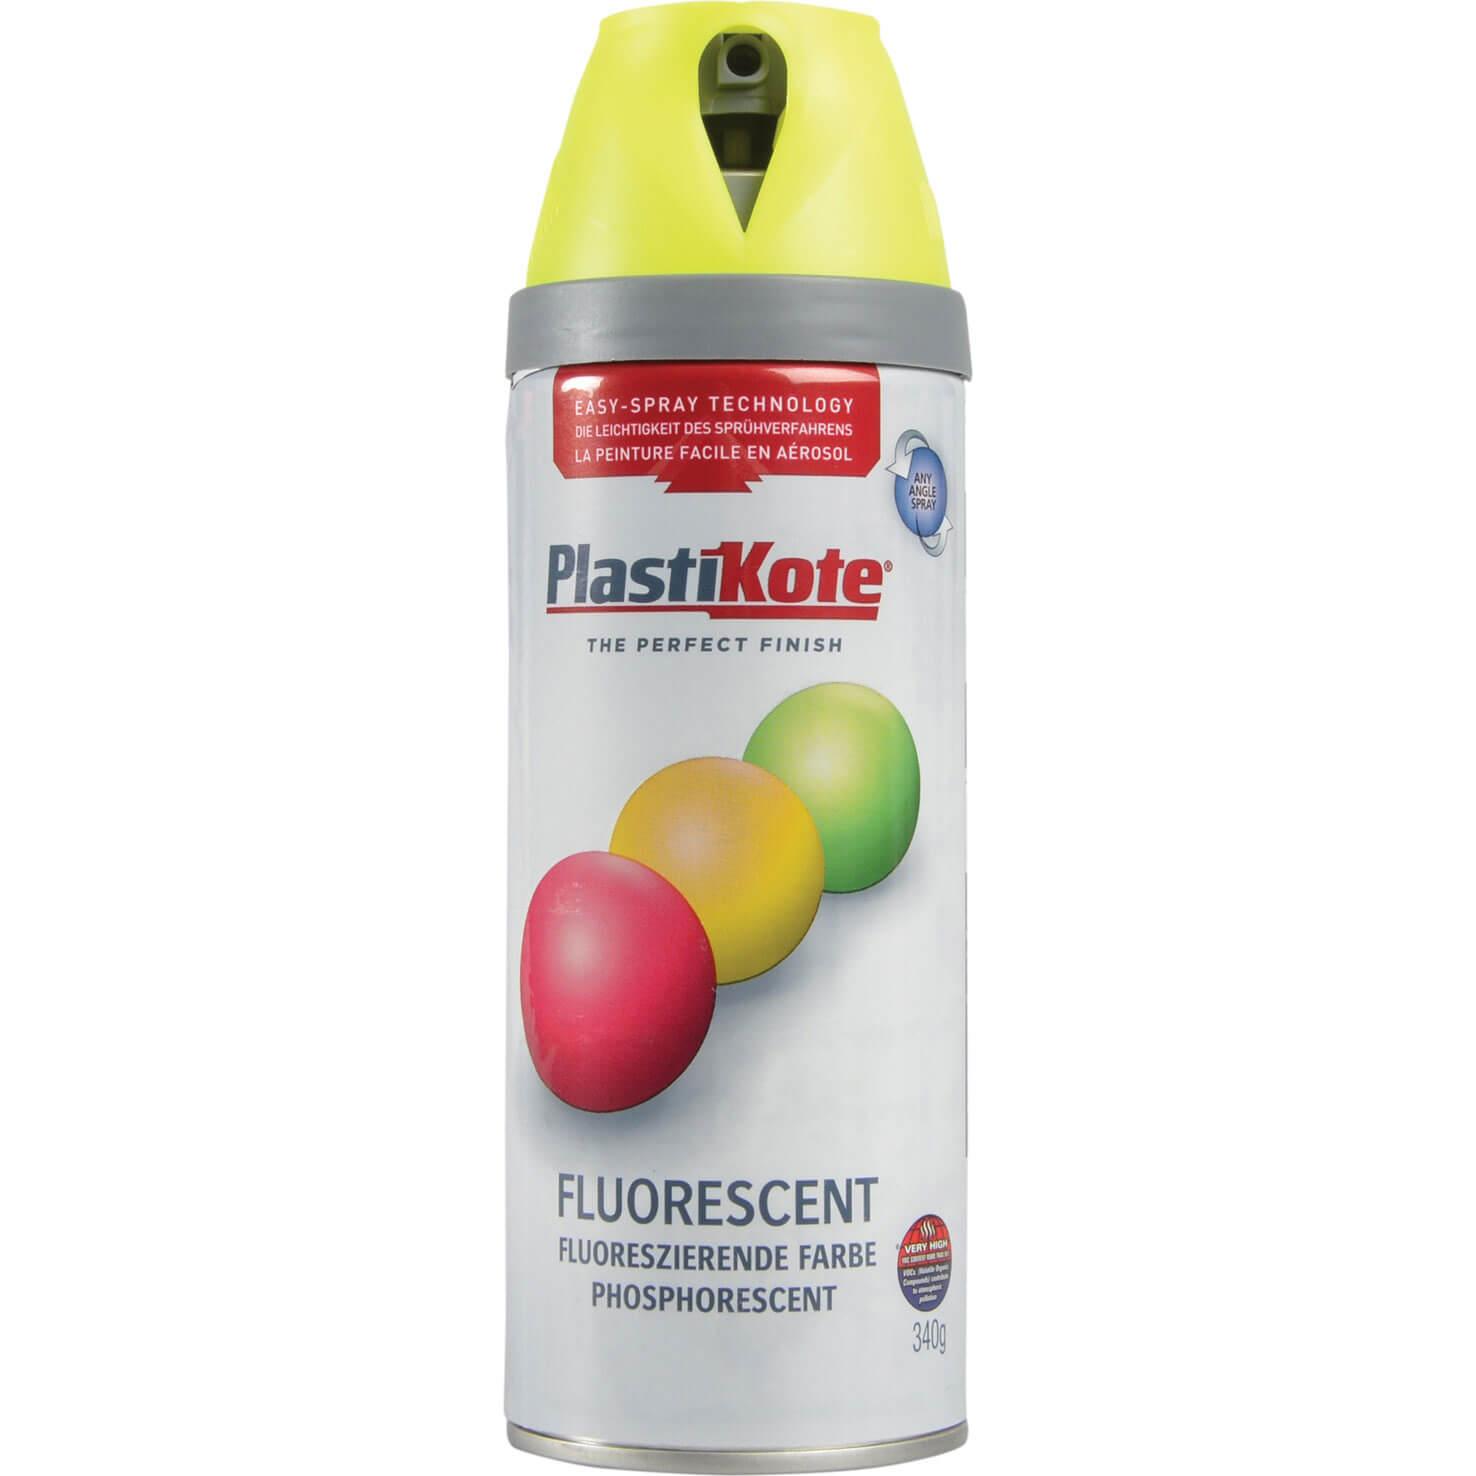 Image of Plastikote Twist & Spray Fluorescent Aerosol Spray Paint Yellow 400ml